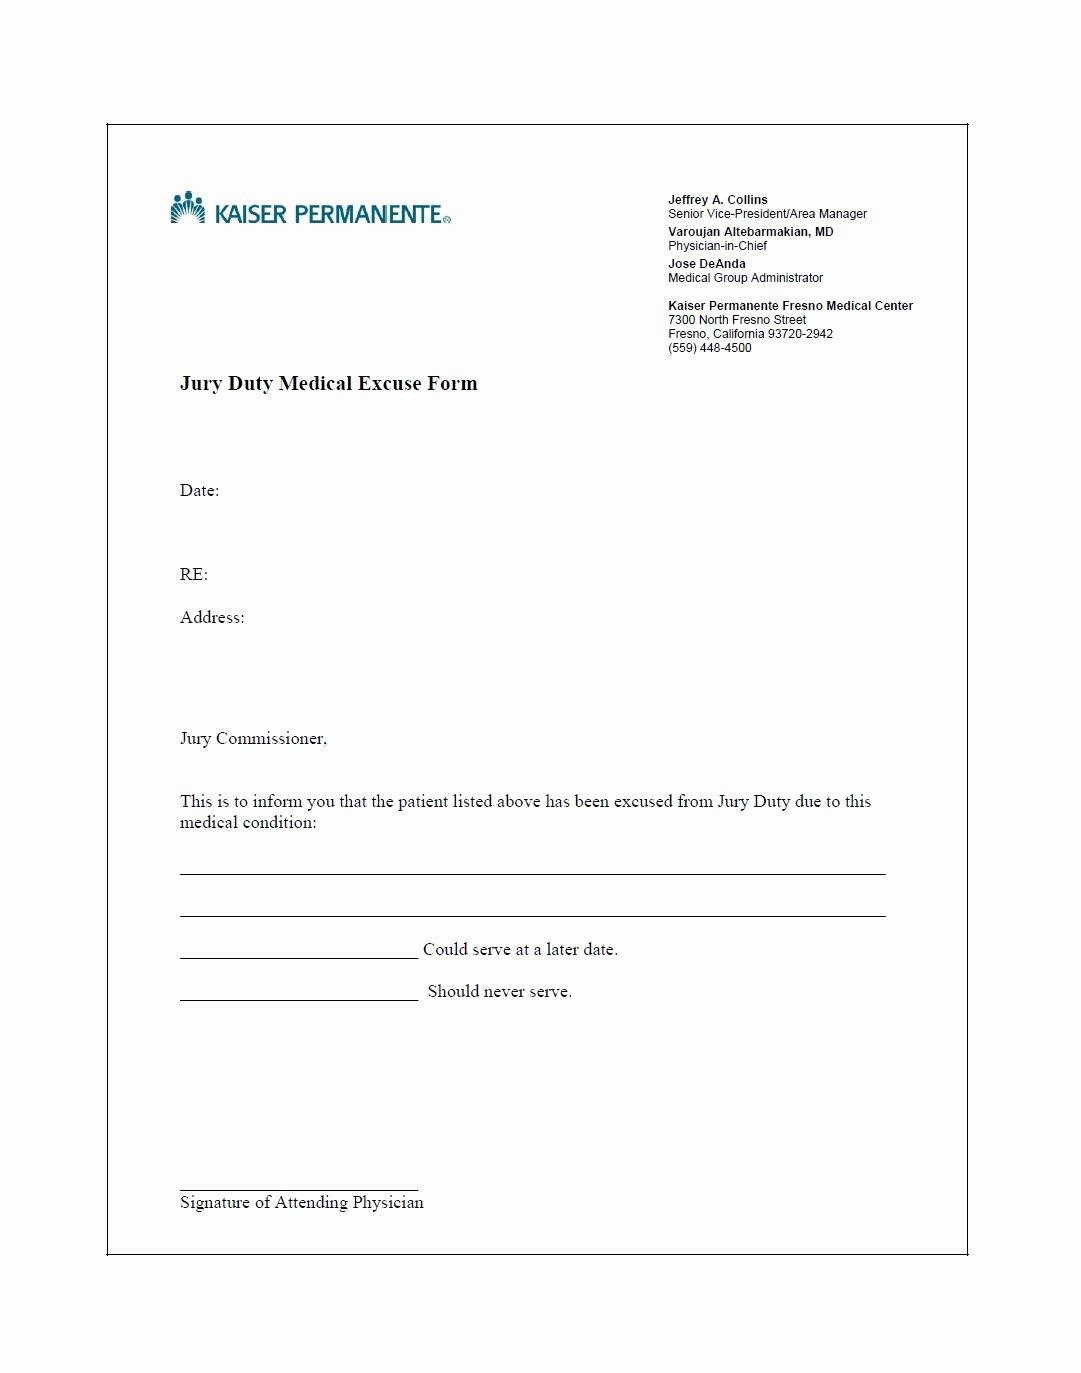 Jury Duty Excuse Letter Employer Lovely 33 Best Jury Duty Excuse Letters [ Tips] Template Lab